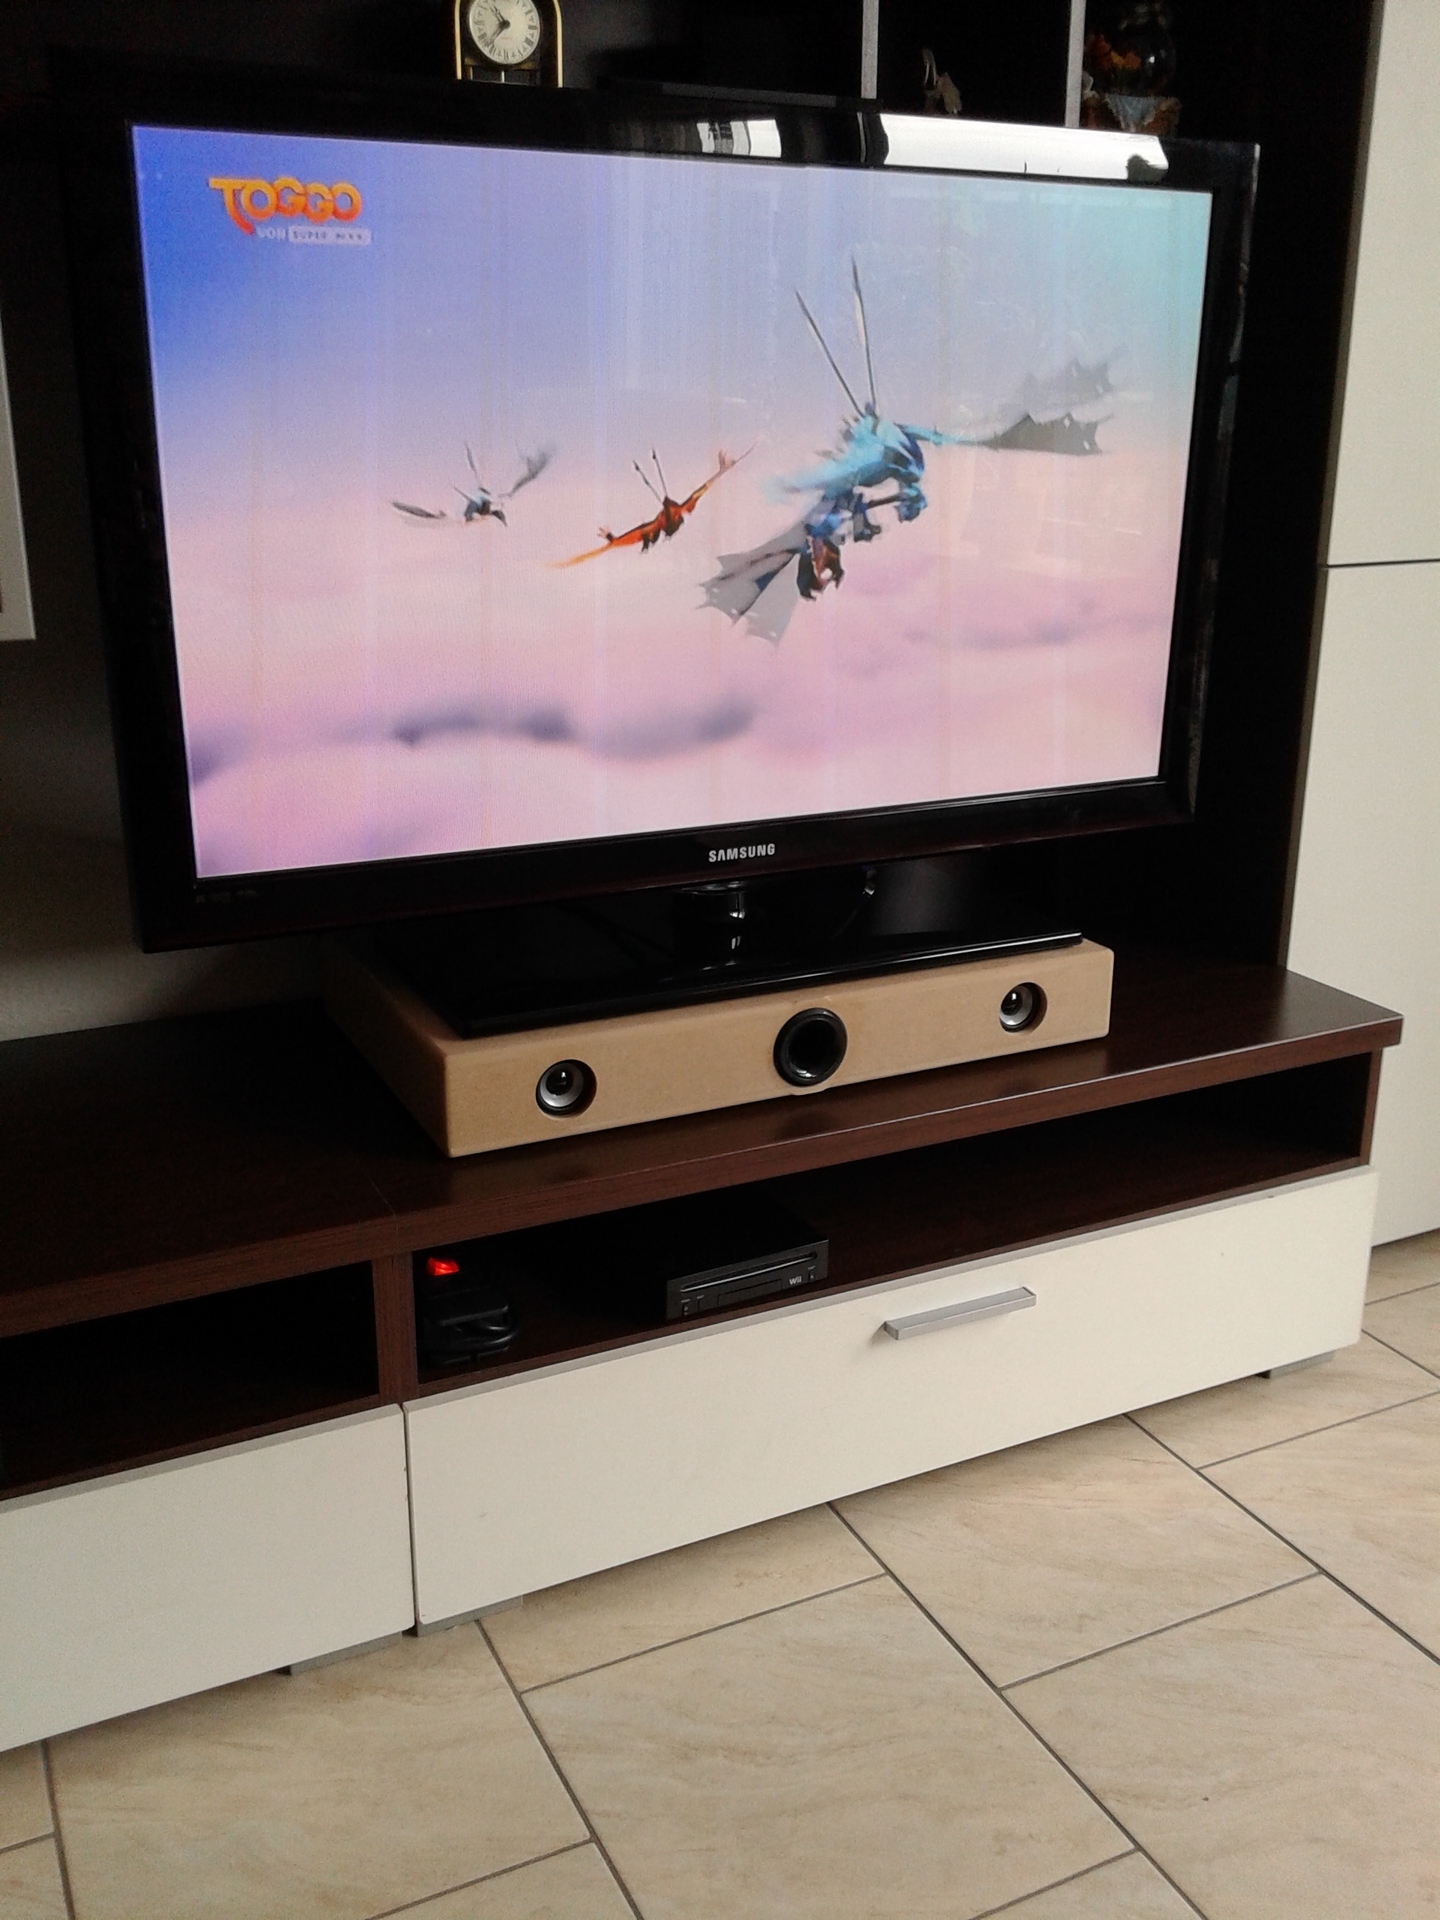 soundbar eigenbau eigenbau soundbar hifi bildergalerie. Black Bedroom Furniture Sets. Home Design Ideas